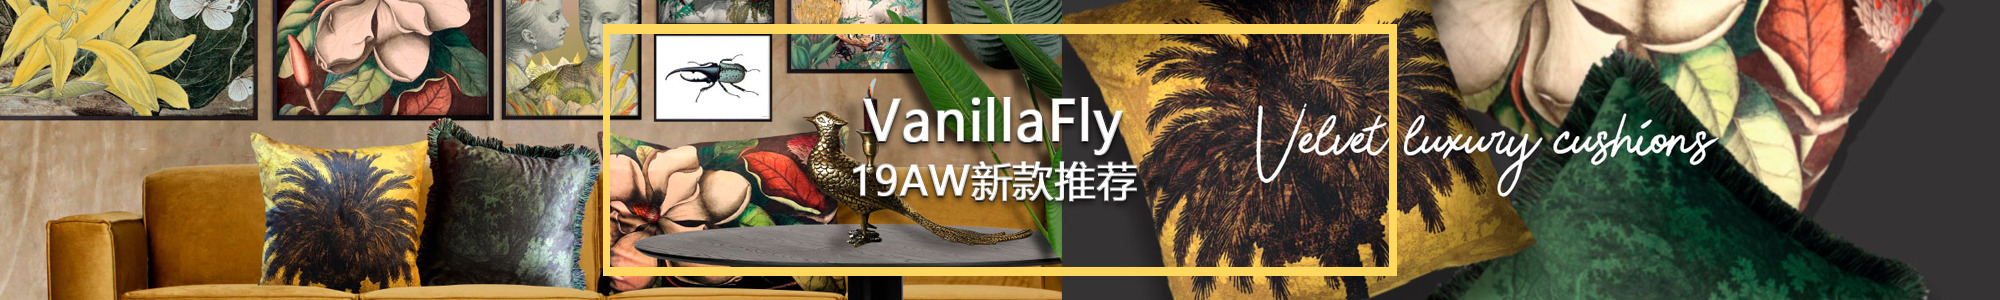 VanillaFly靠垫